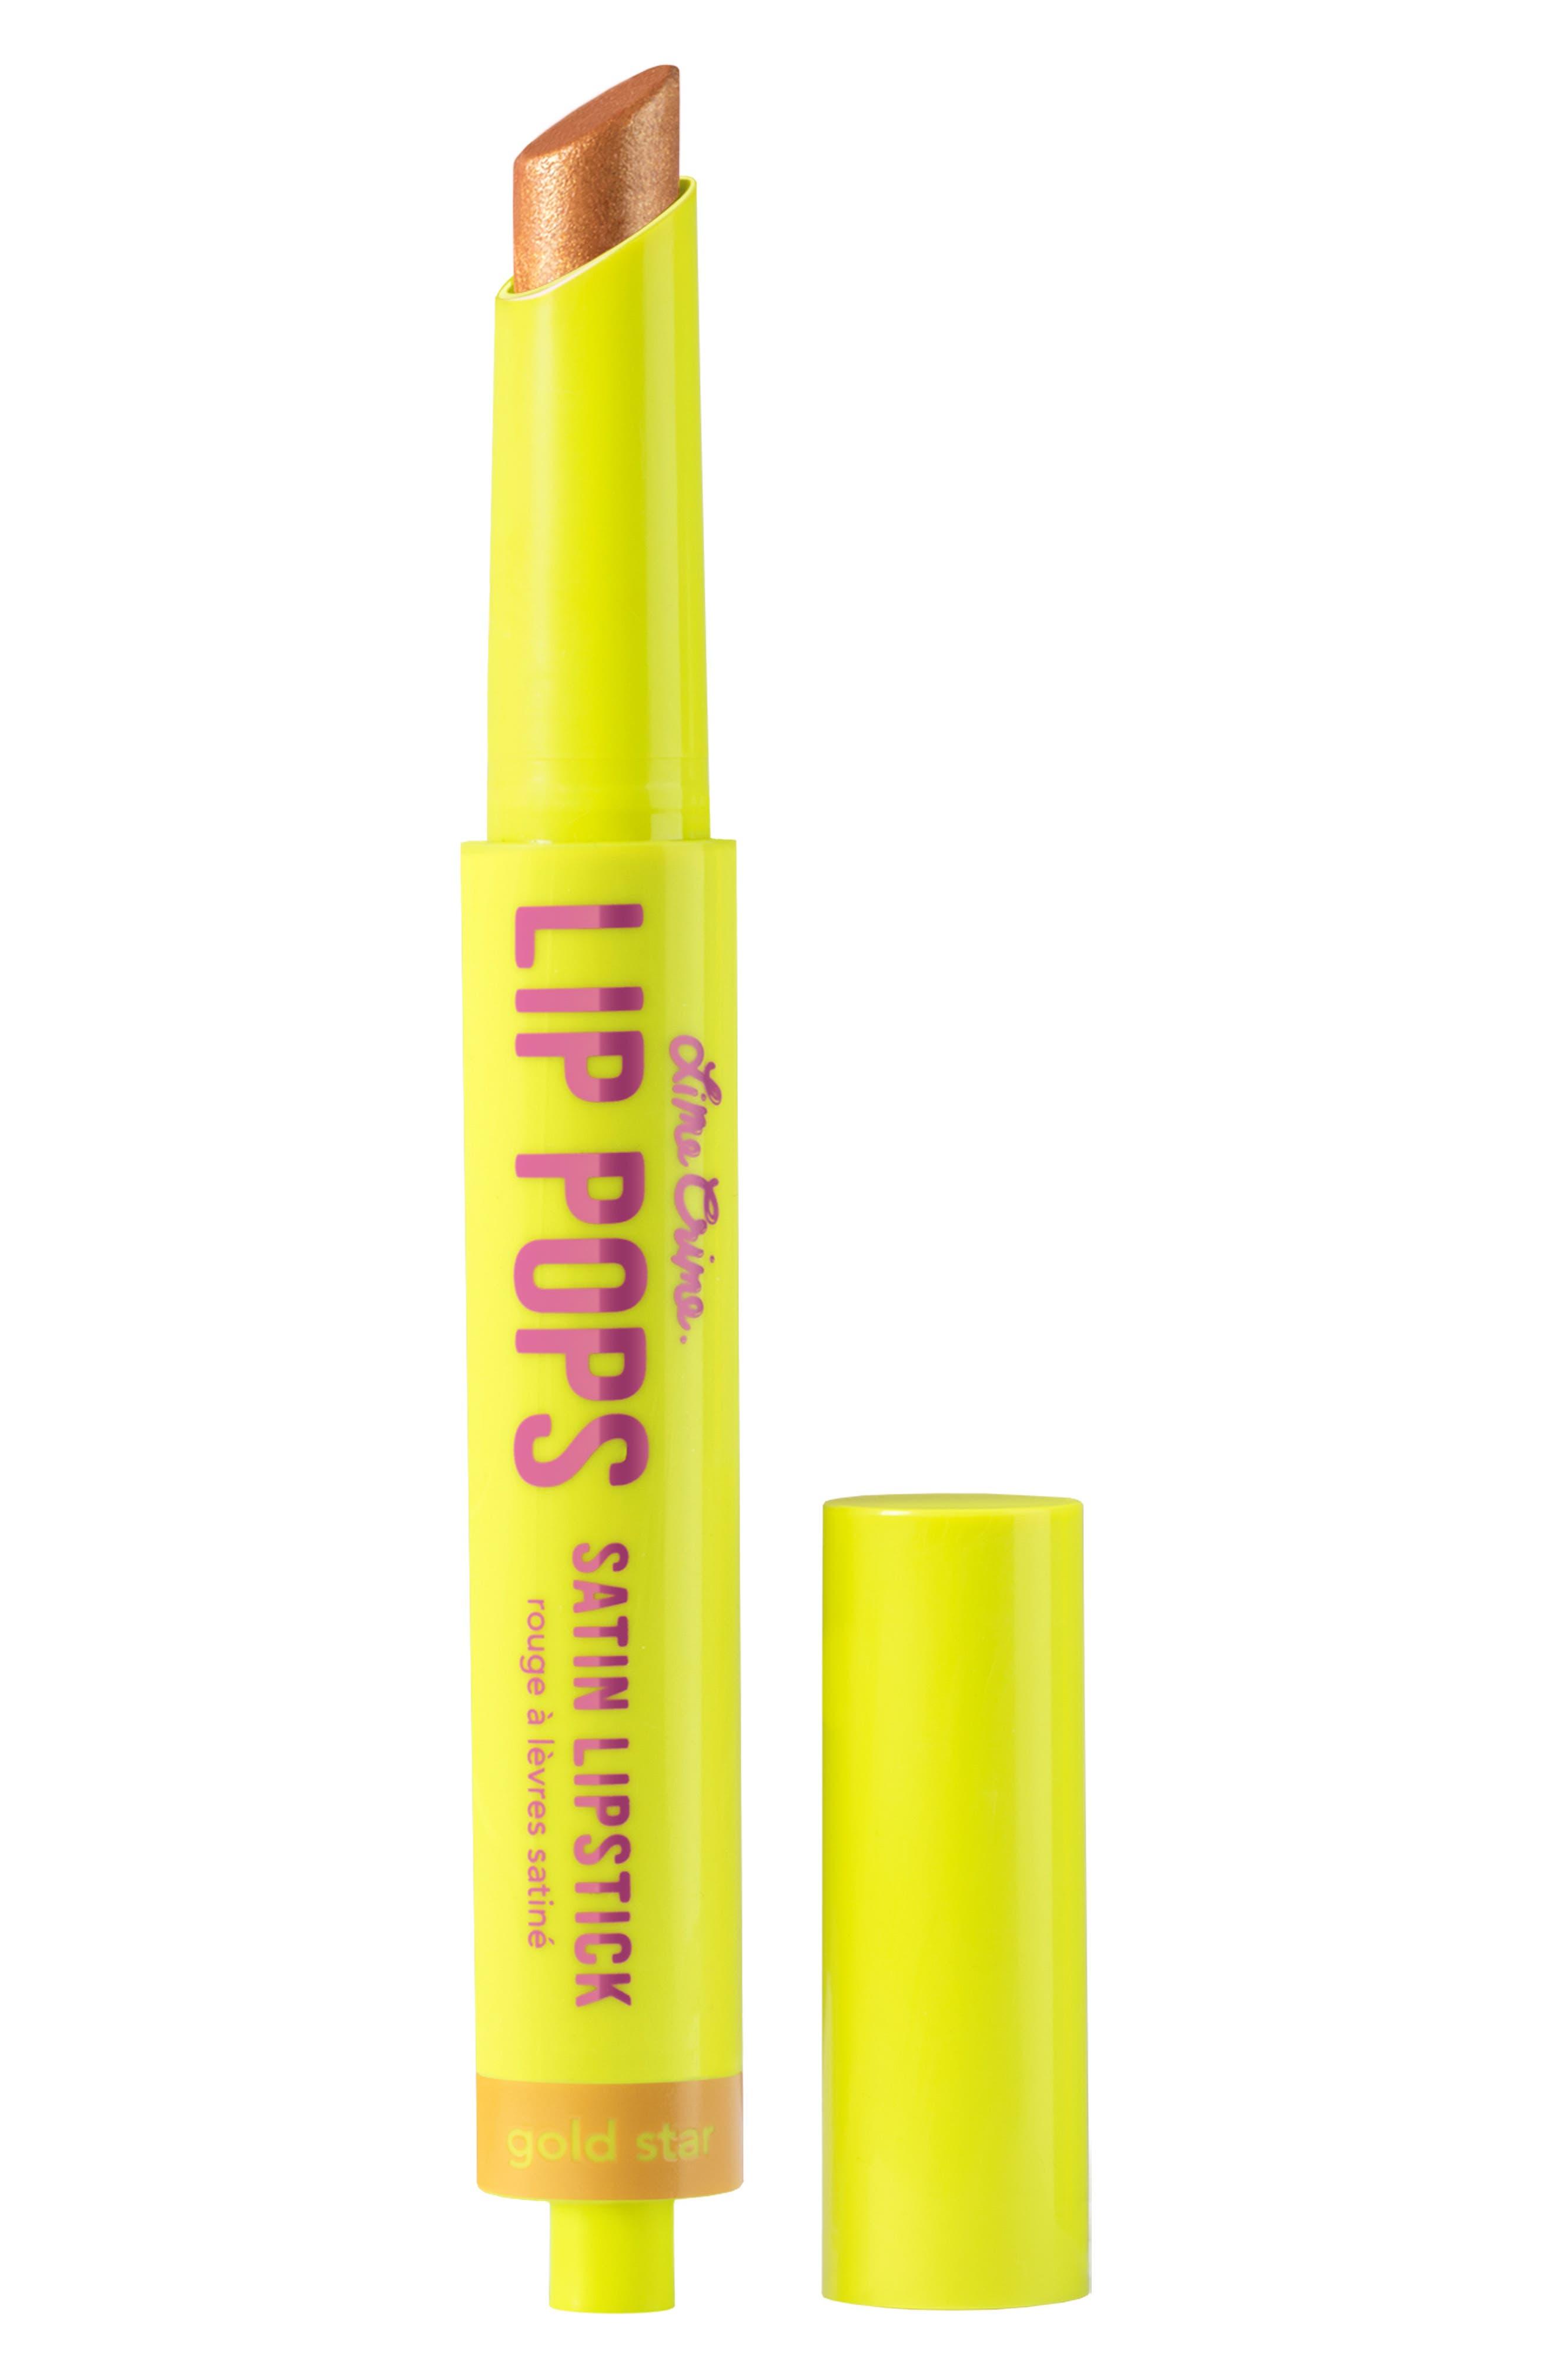 Image of Lime Crime Lip Pops Lipstick - Gold Star